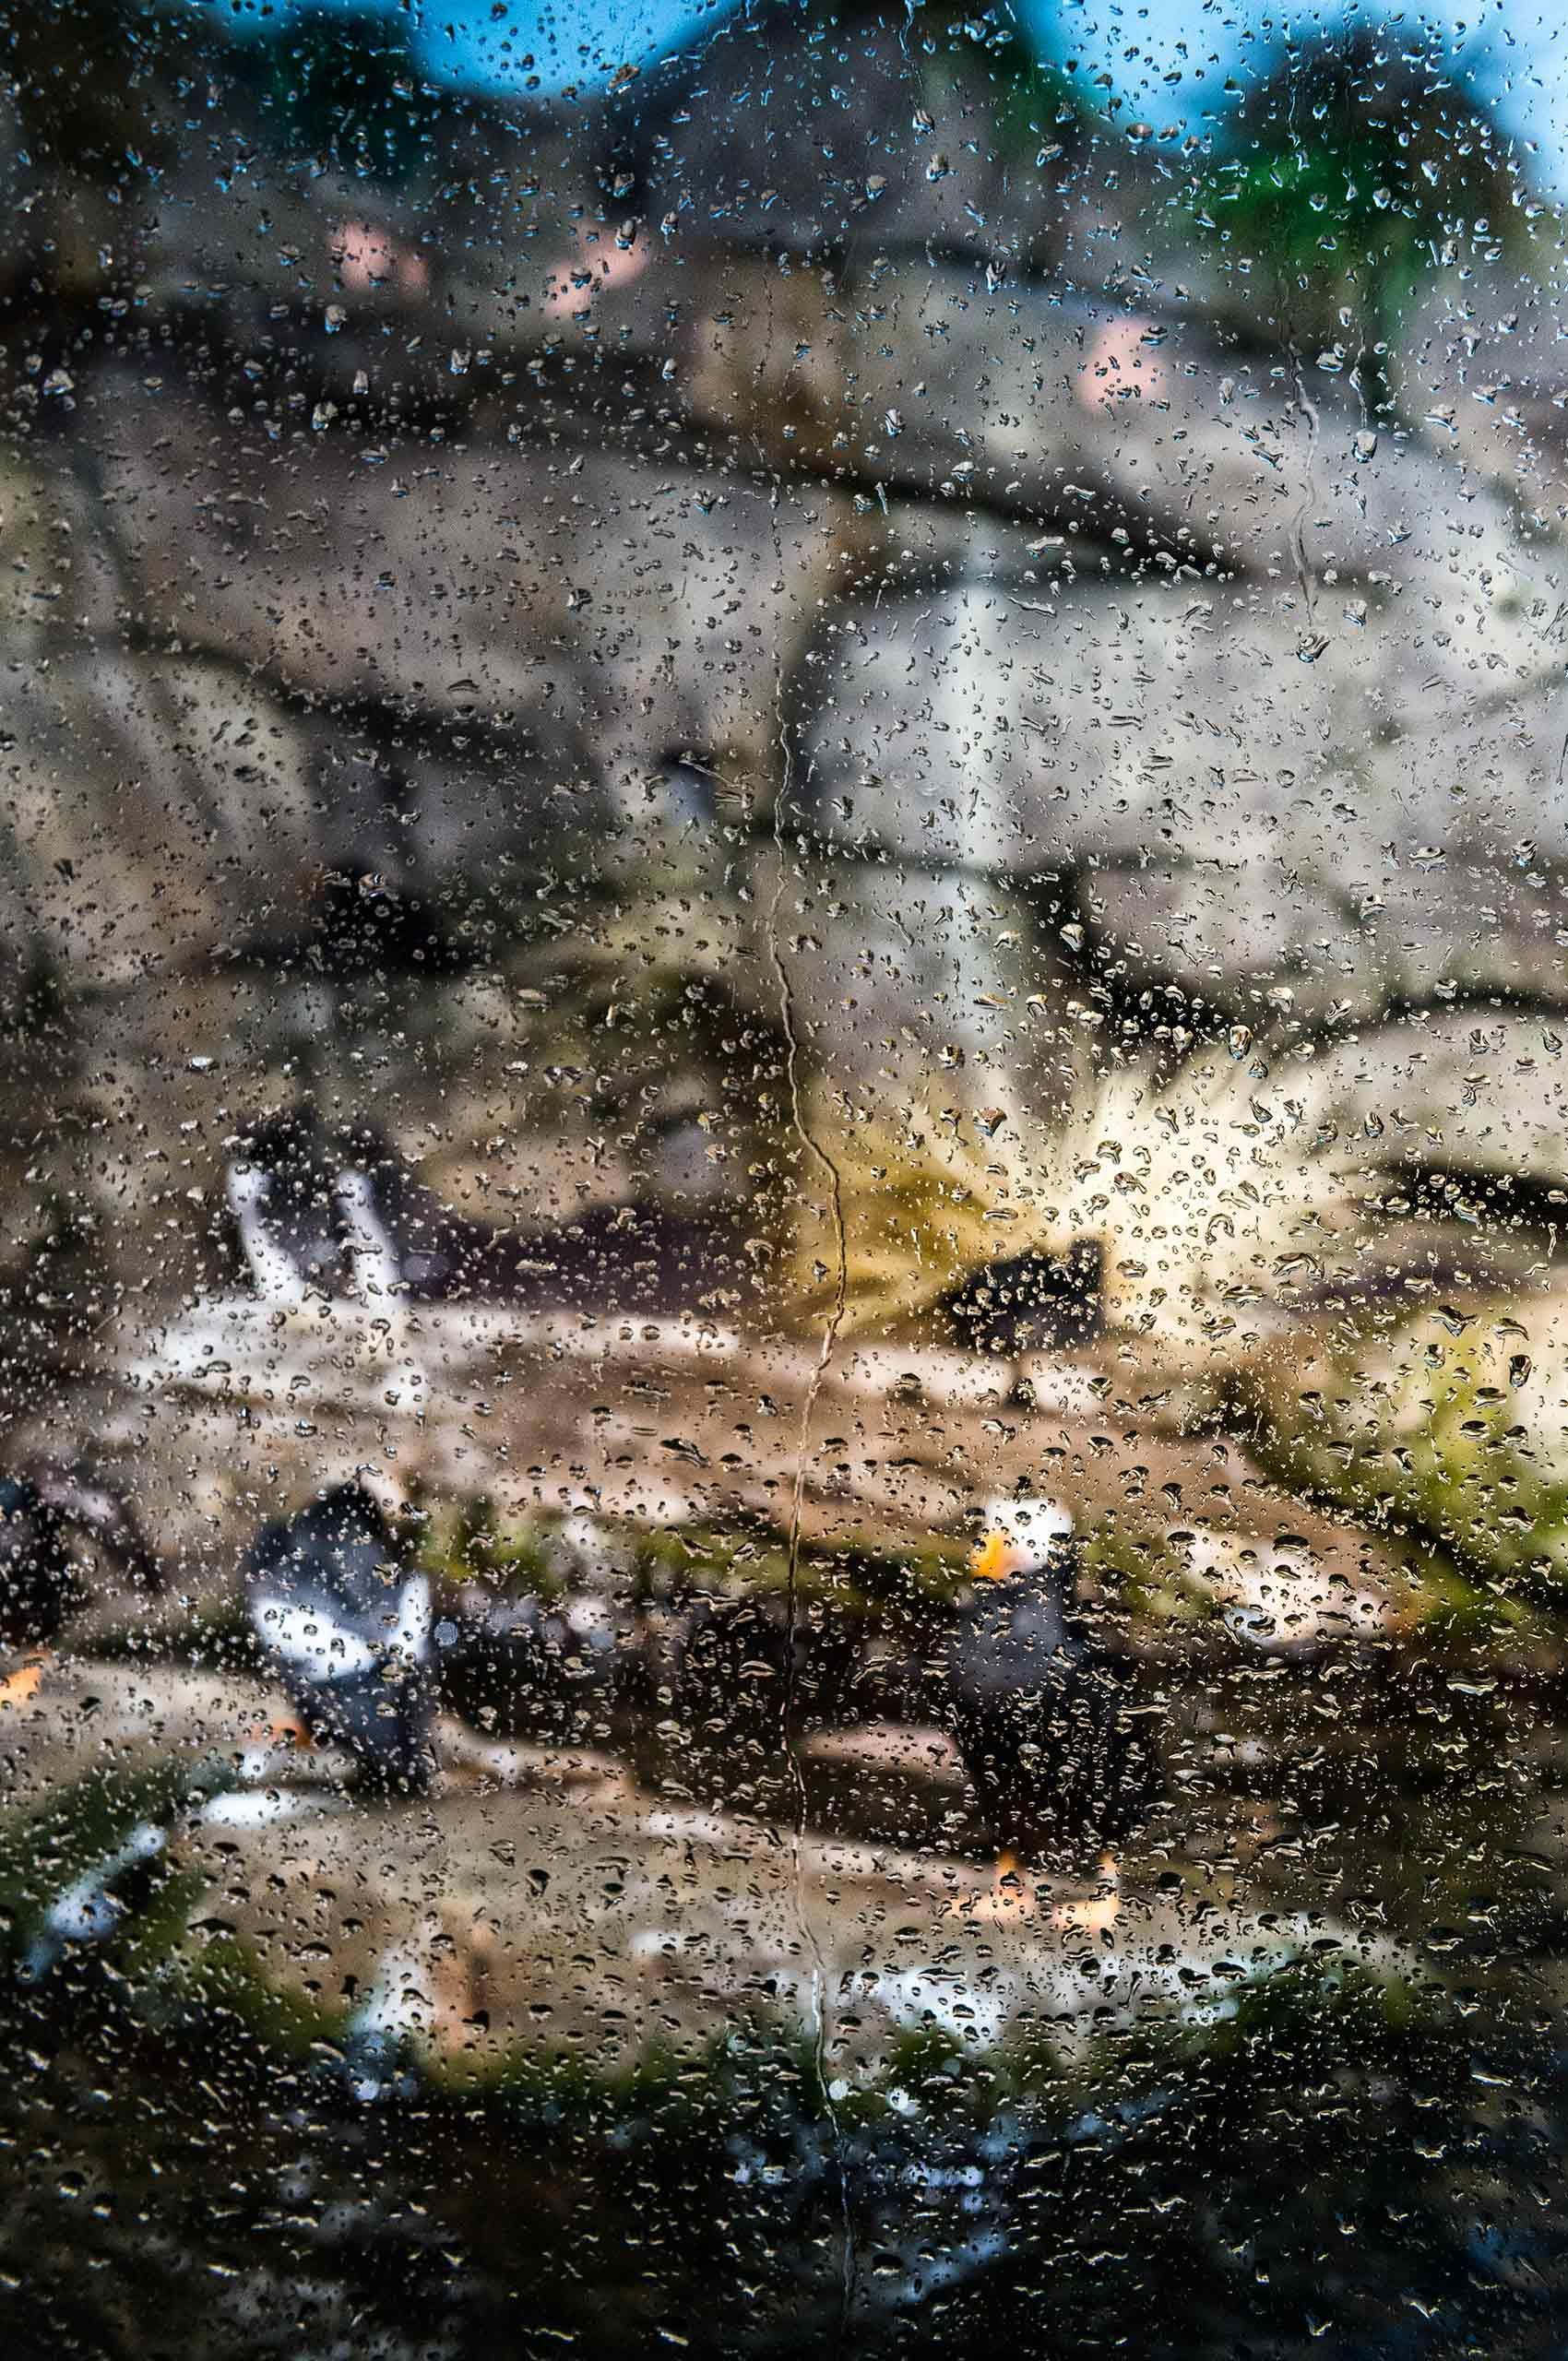 drops-on-window-penguins-montereybayaquarium-by-HenrikOlundPhotography.jpg